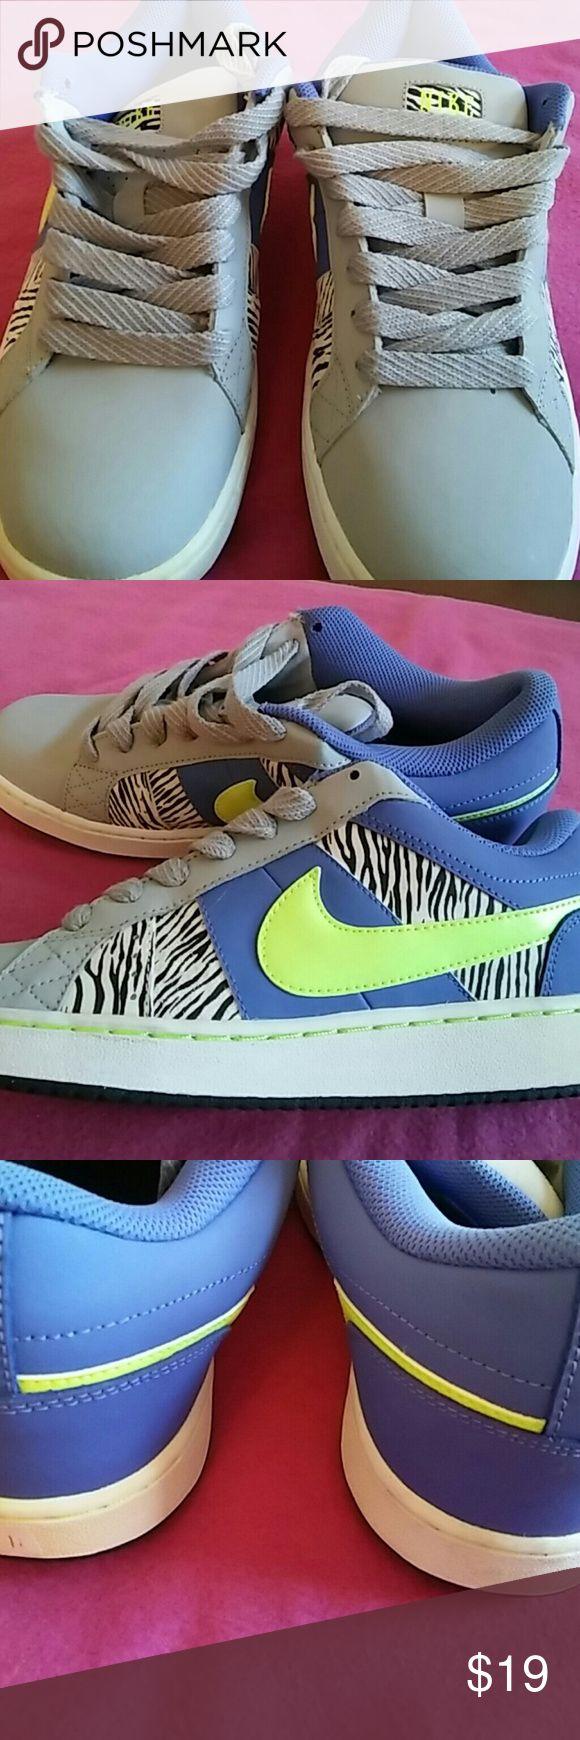 Ladies sneakers size 11 Nike sneakers purple lime green and zebra print. Worn once. Nike Shoes Sneakers